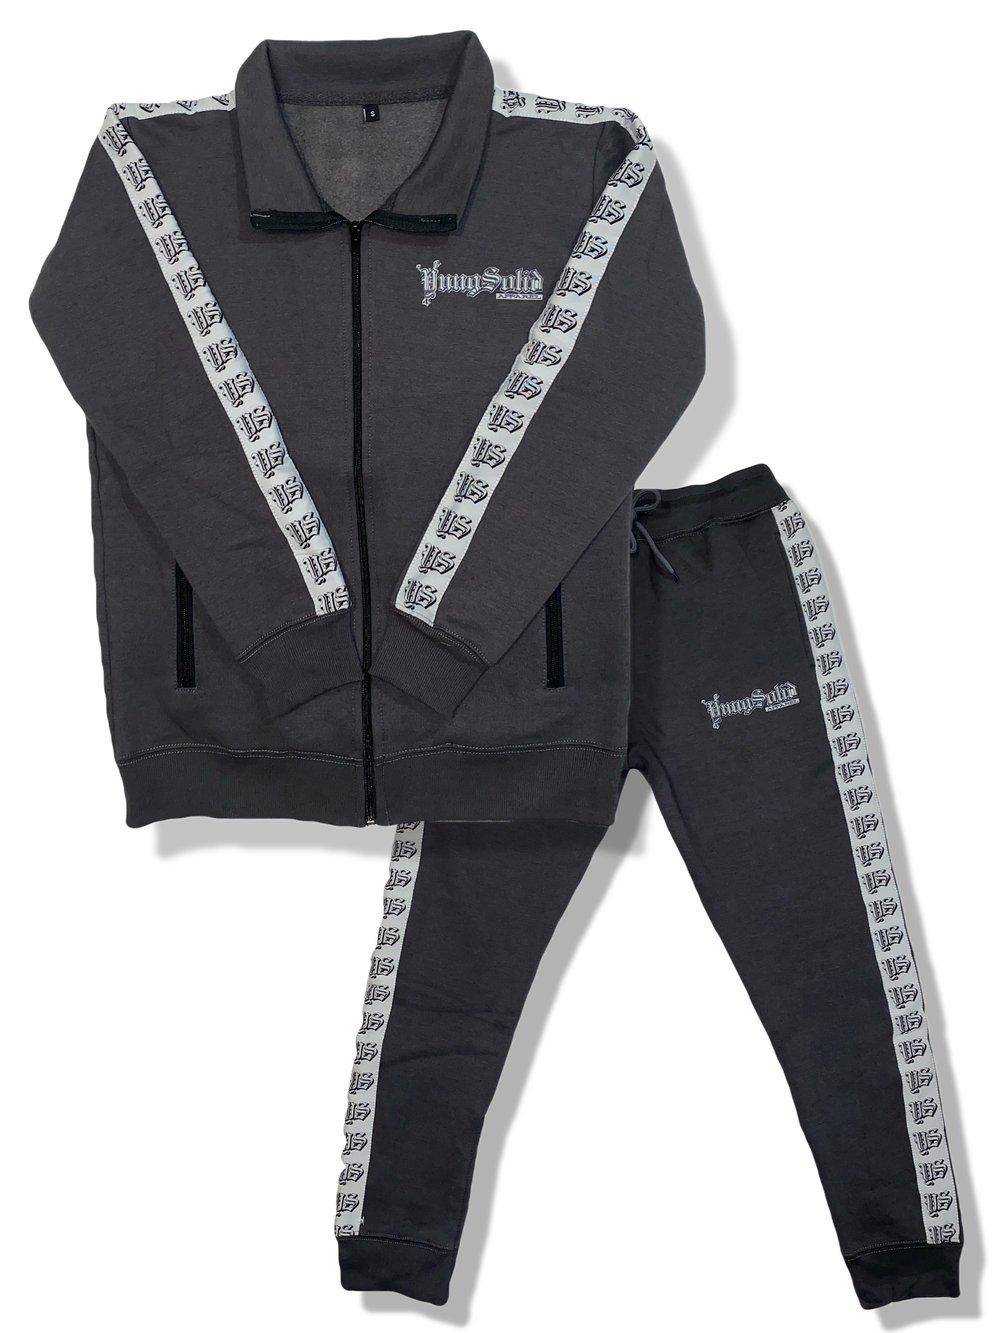 Image of Grey YS Unisex Sweat suit